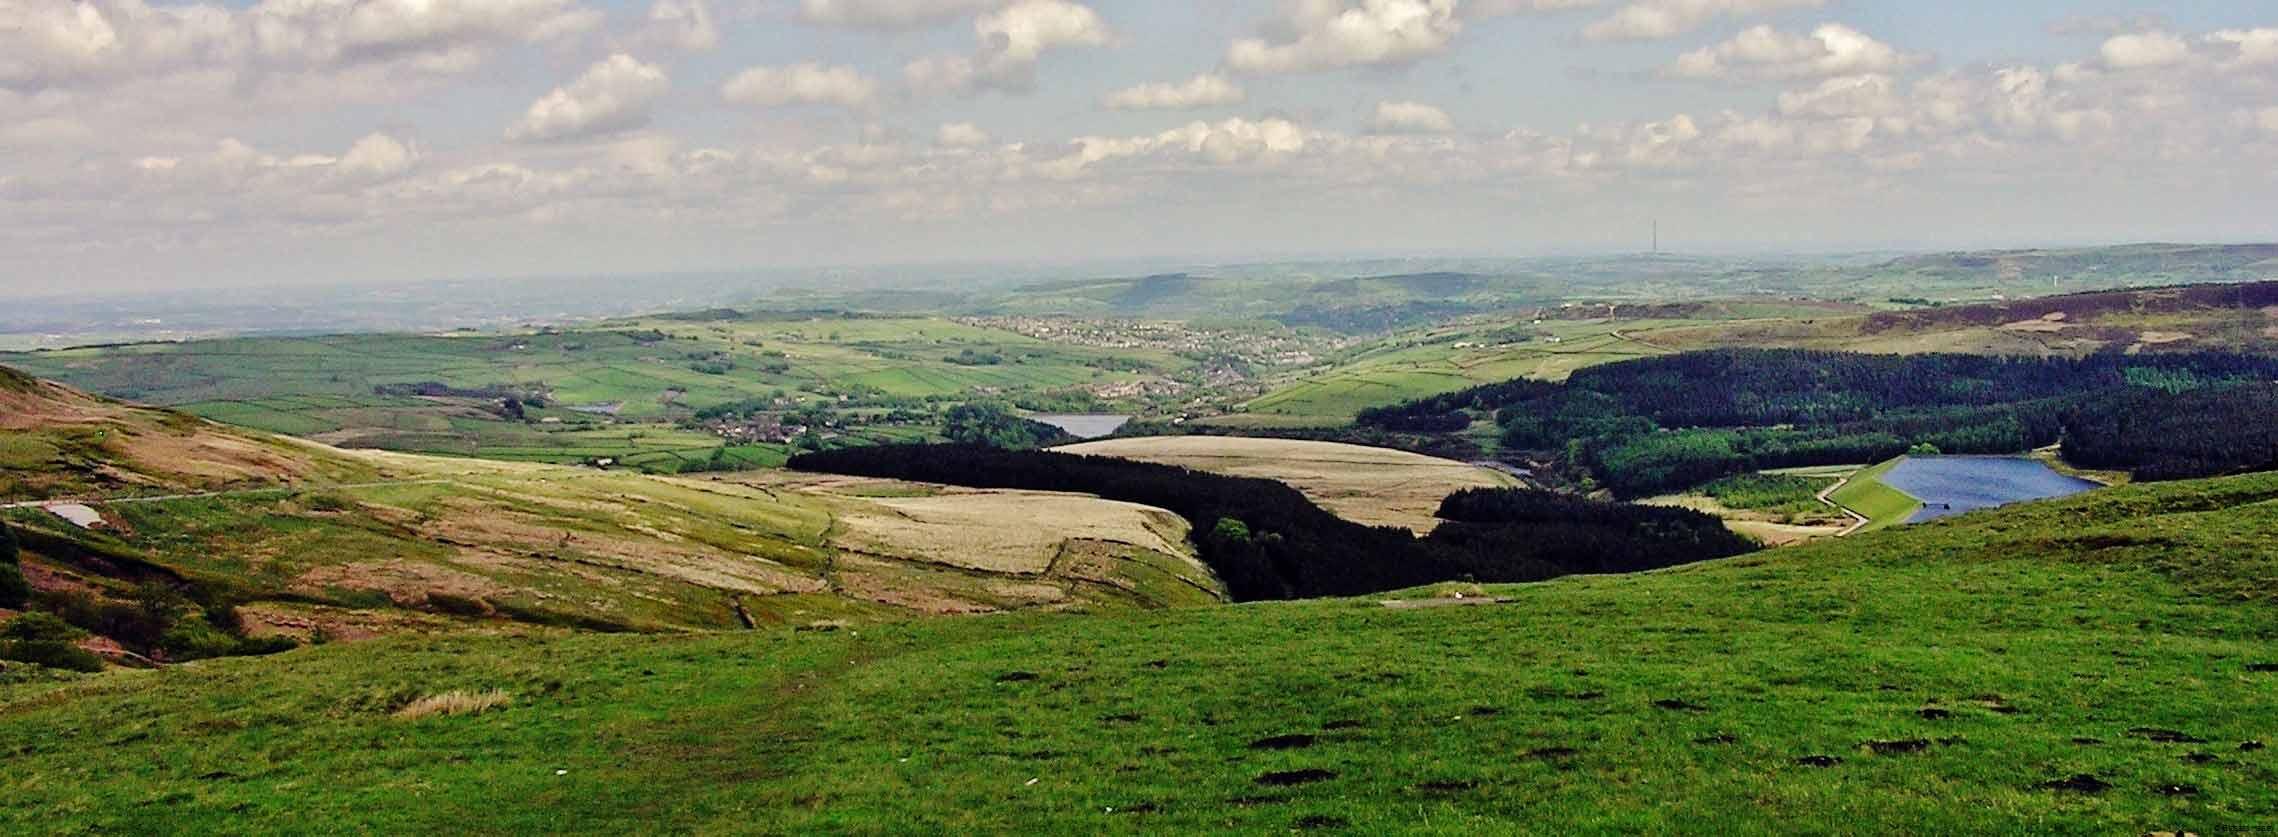 Holme Moors 2